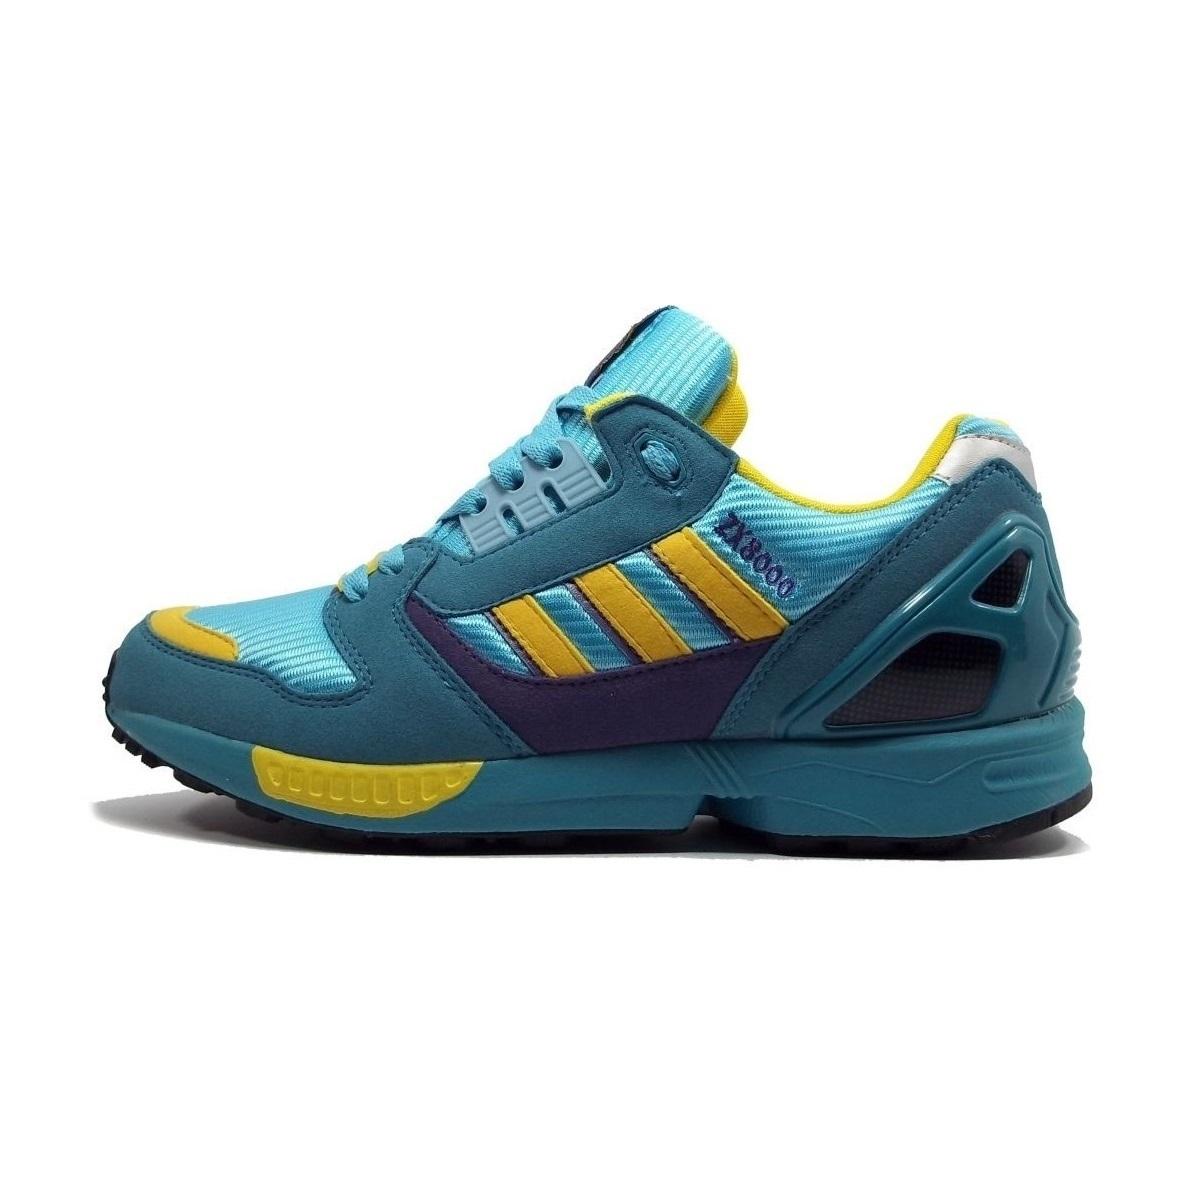 کفش راحتی مردانه مدل zx8000 کد A9